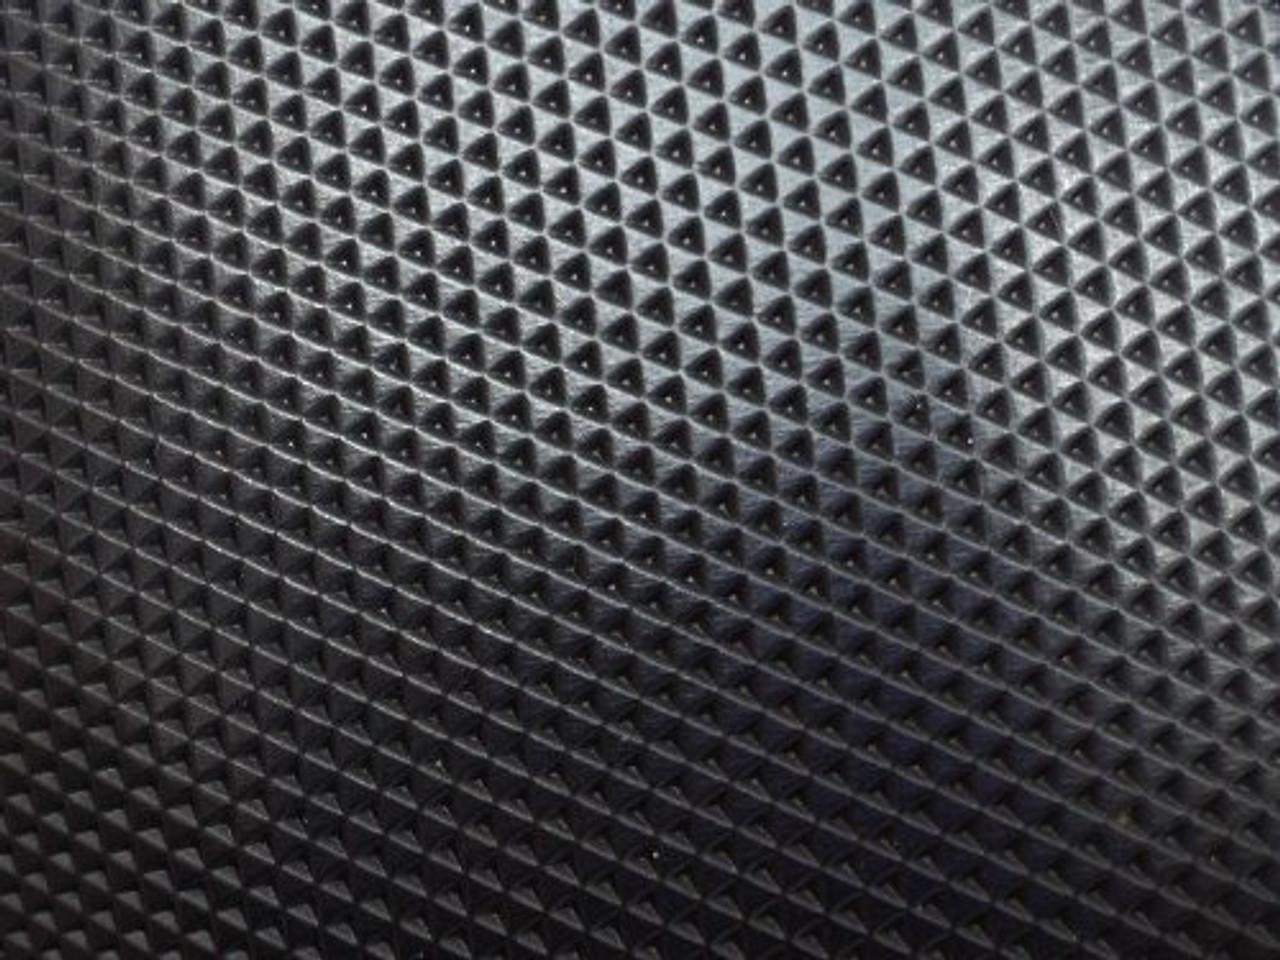 Ruger LCR Ambidextrous Custom Fit Leather Trimmed orGUNizer Pocket Holster by Garrison Grip (D)